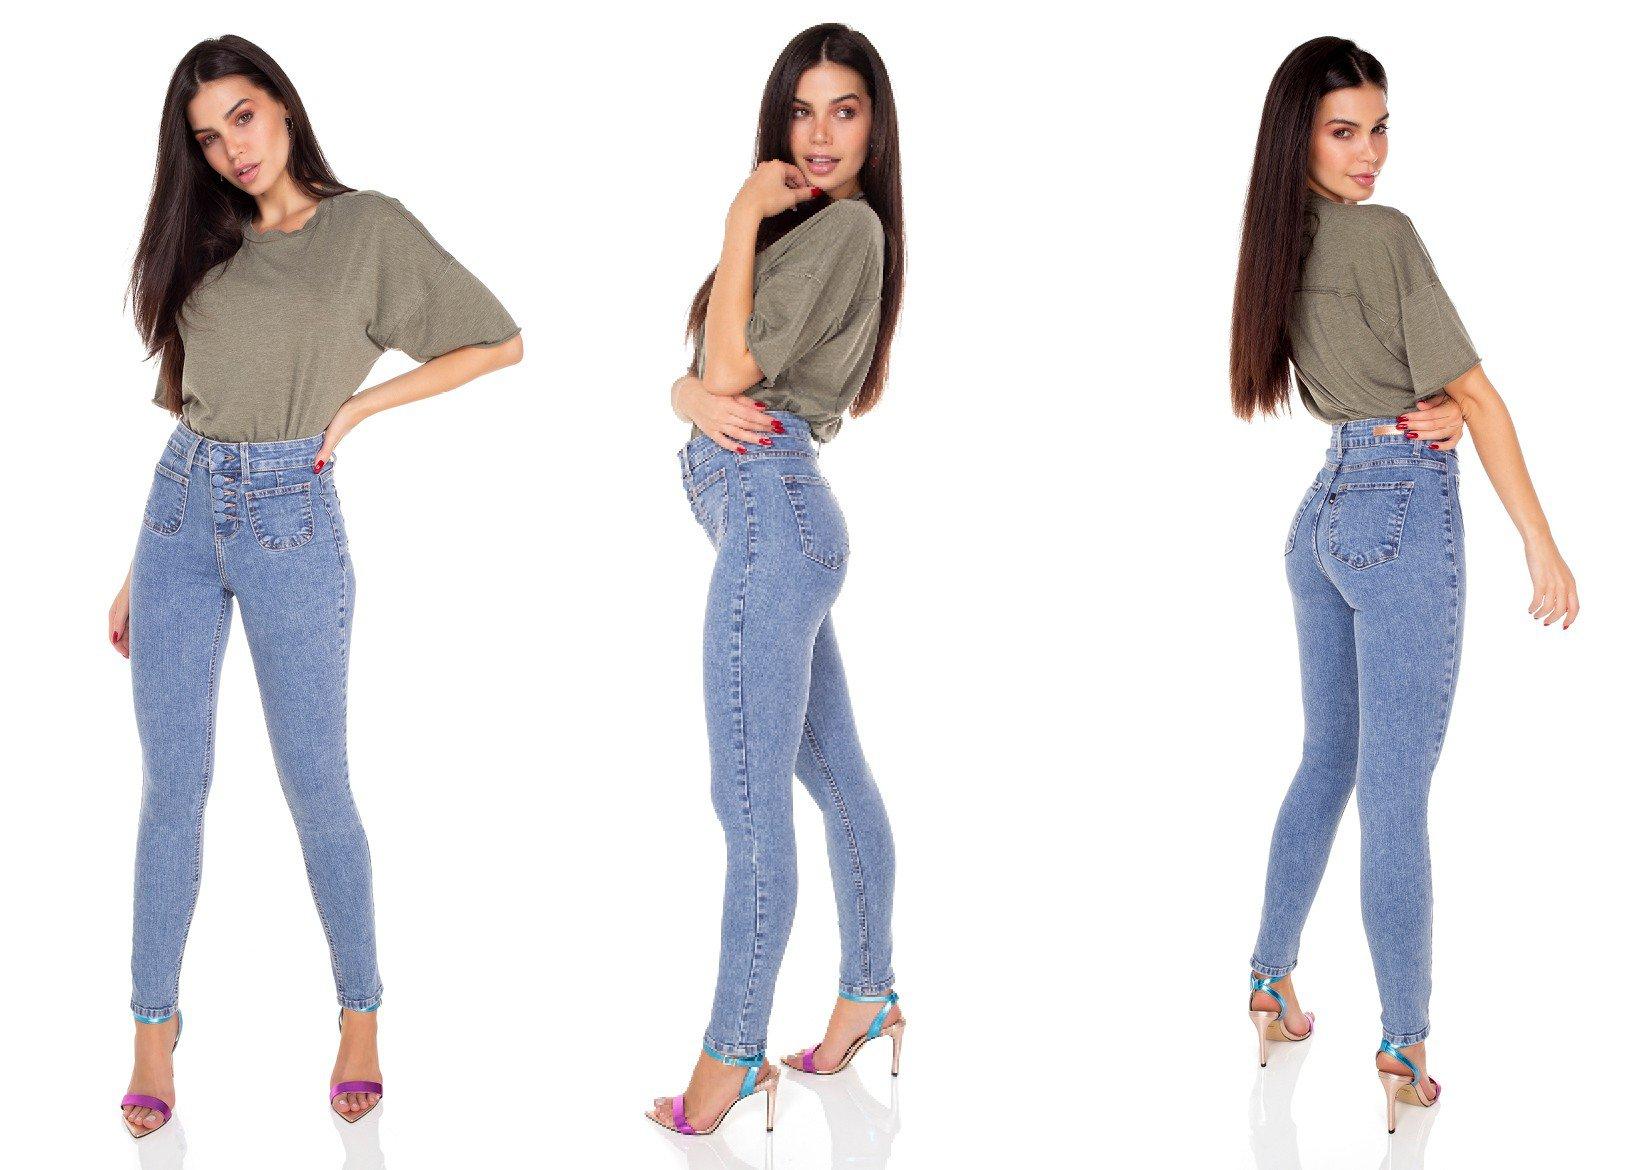 dz3439 calca jeans feminina skinny media cigarrete botoes encapados denim zero tripla